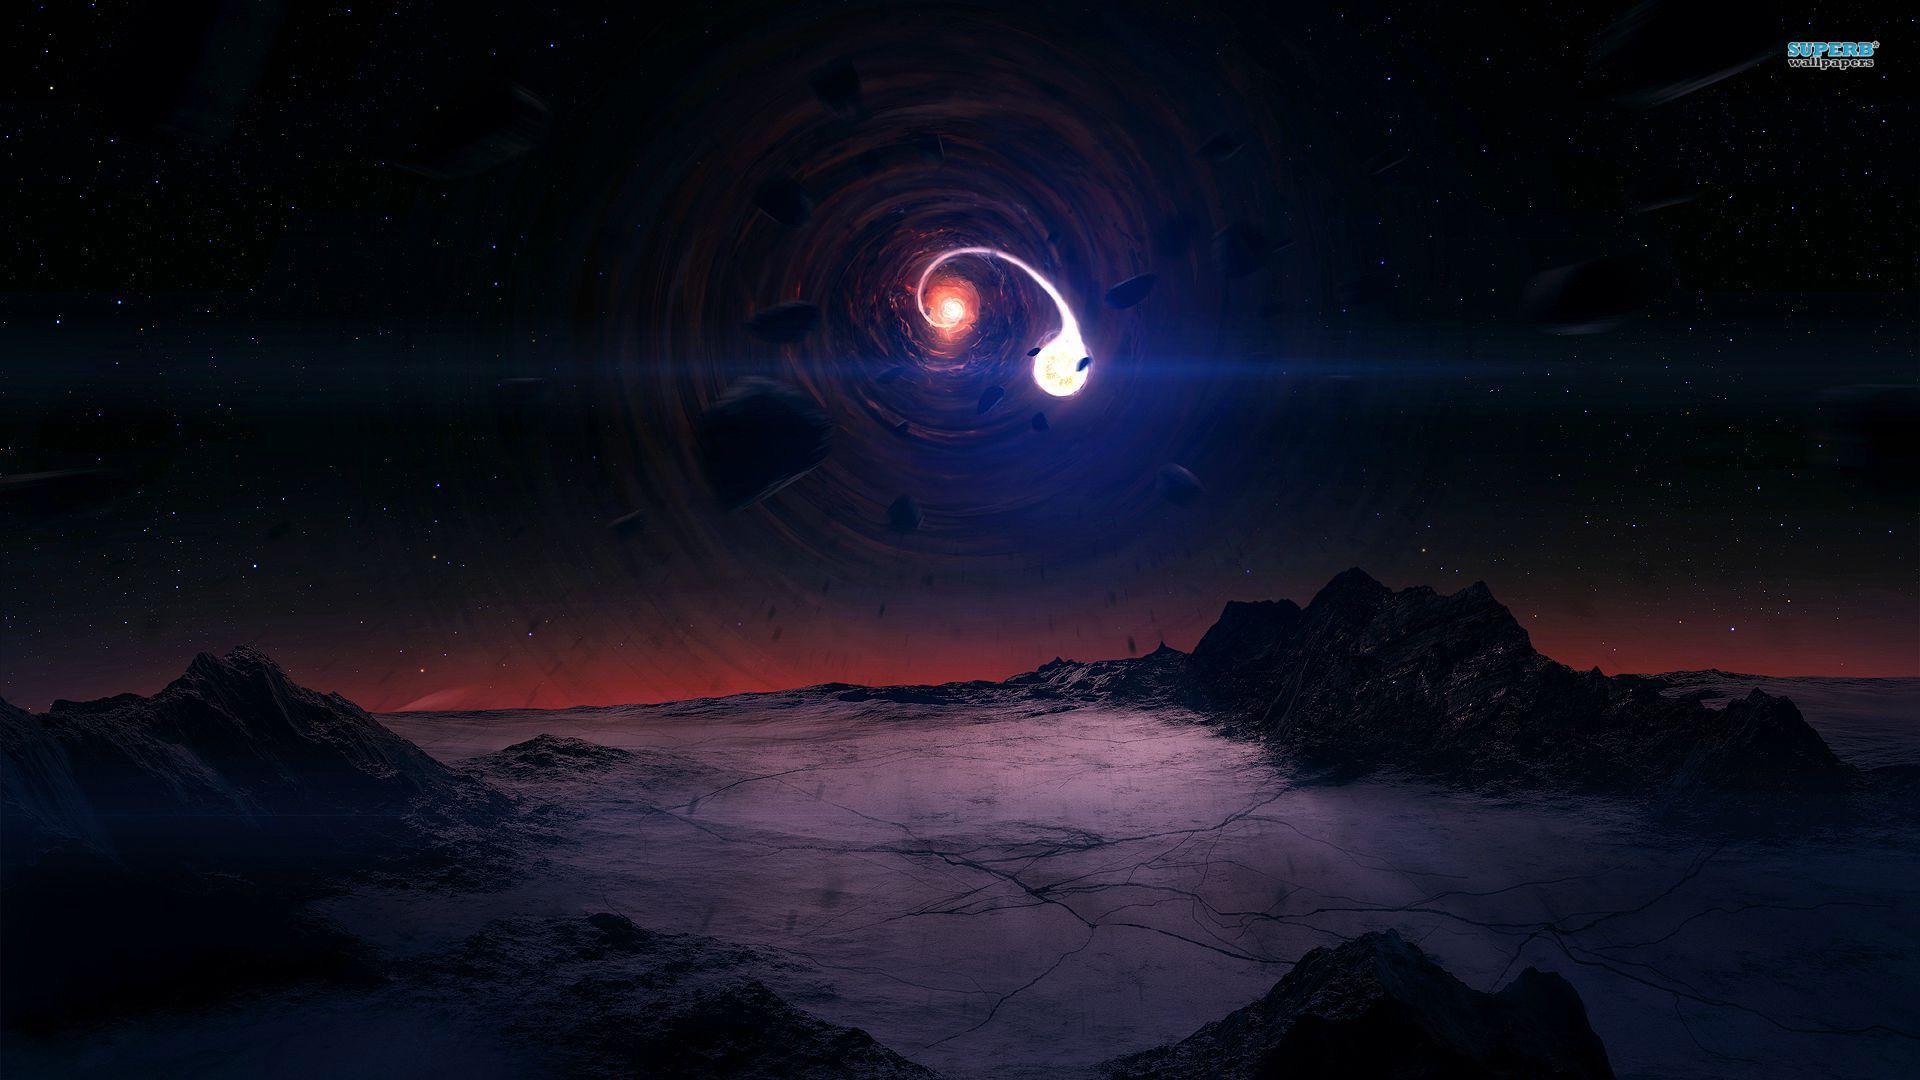 interstellar black hole gargantua hd desktop wallpaper high